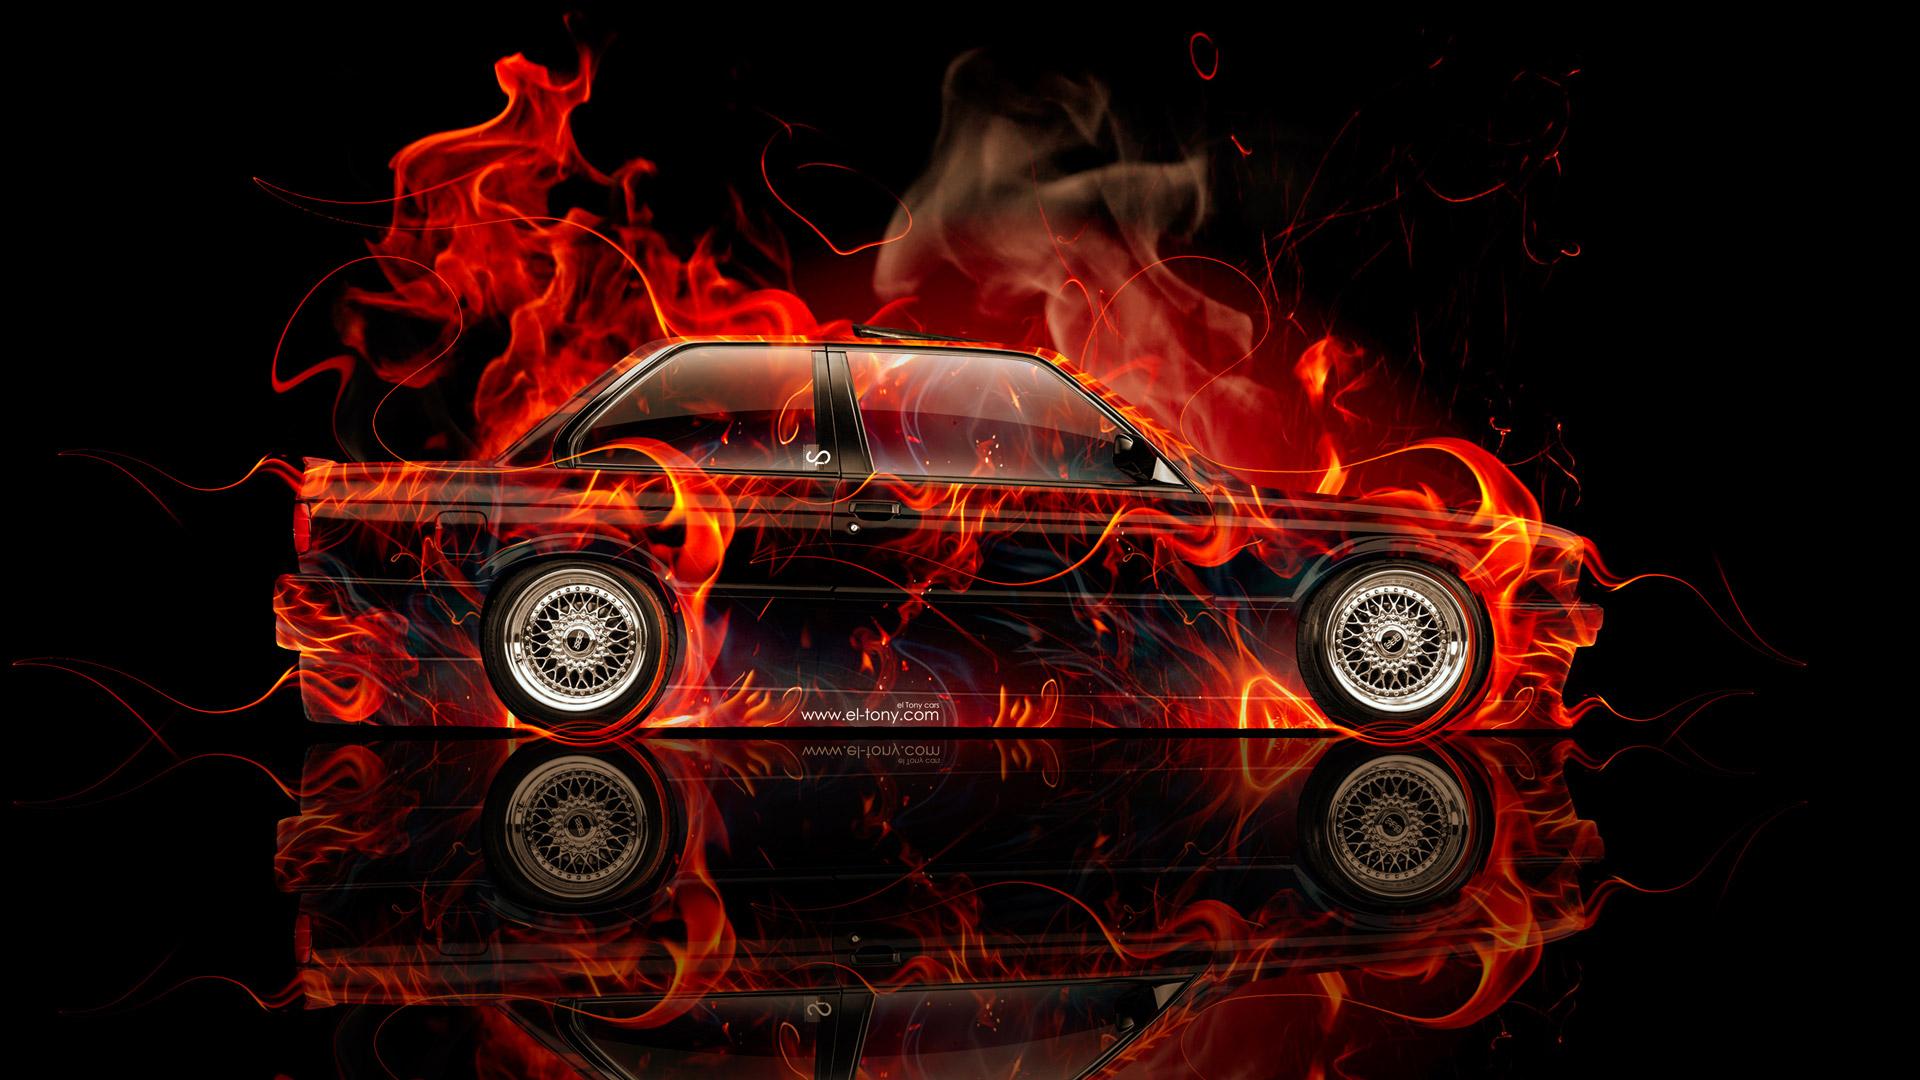 Е30 в огне